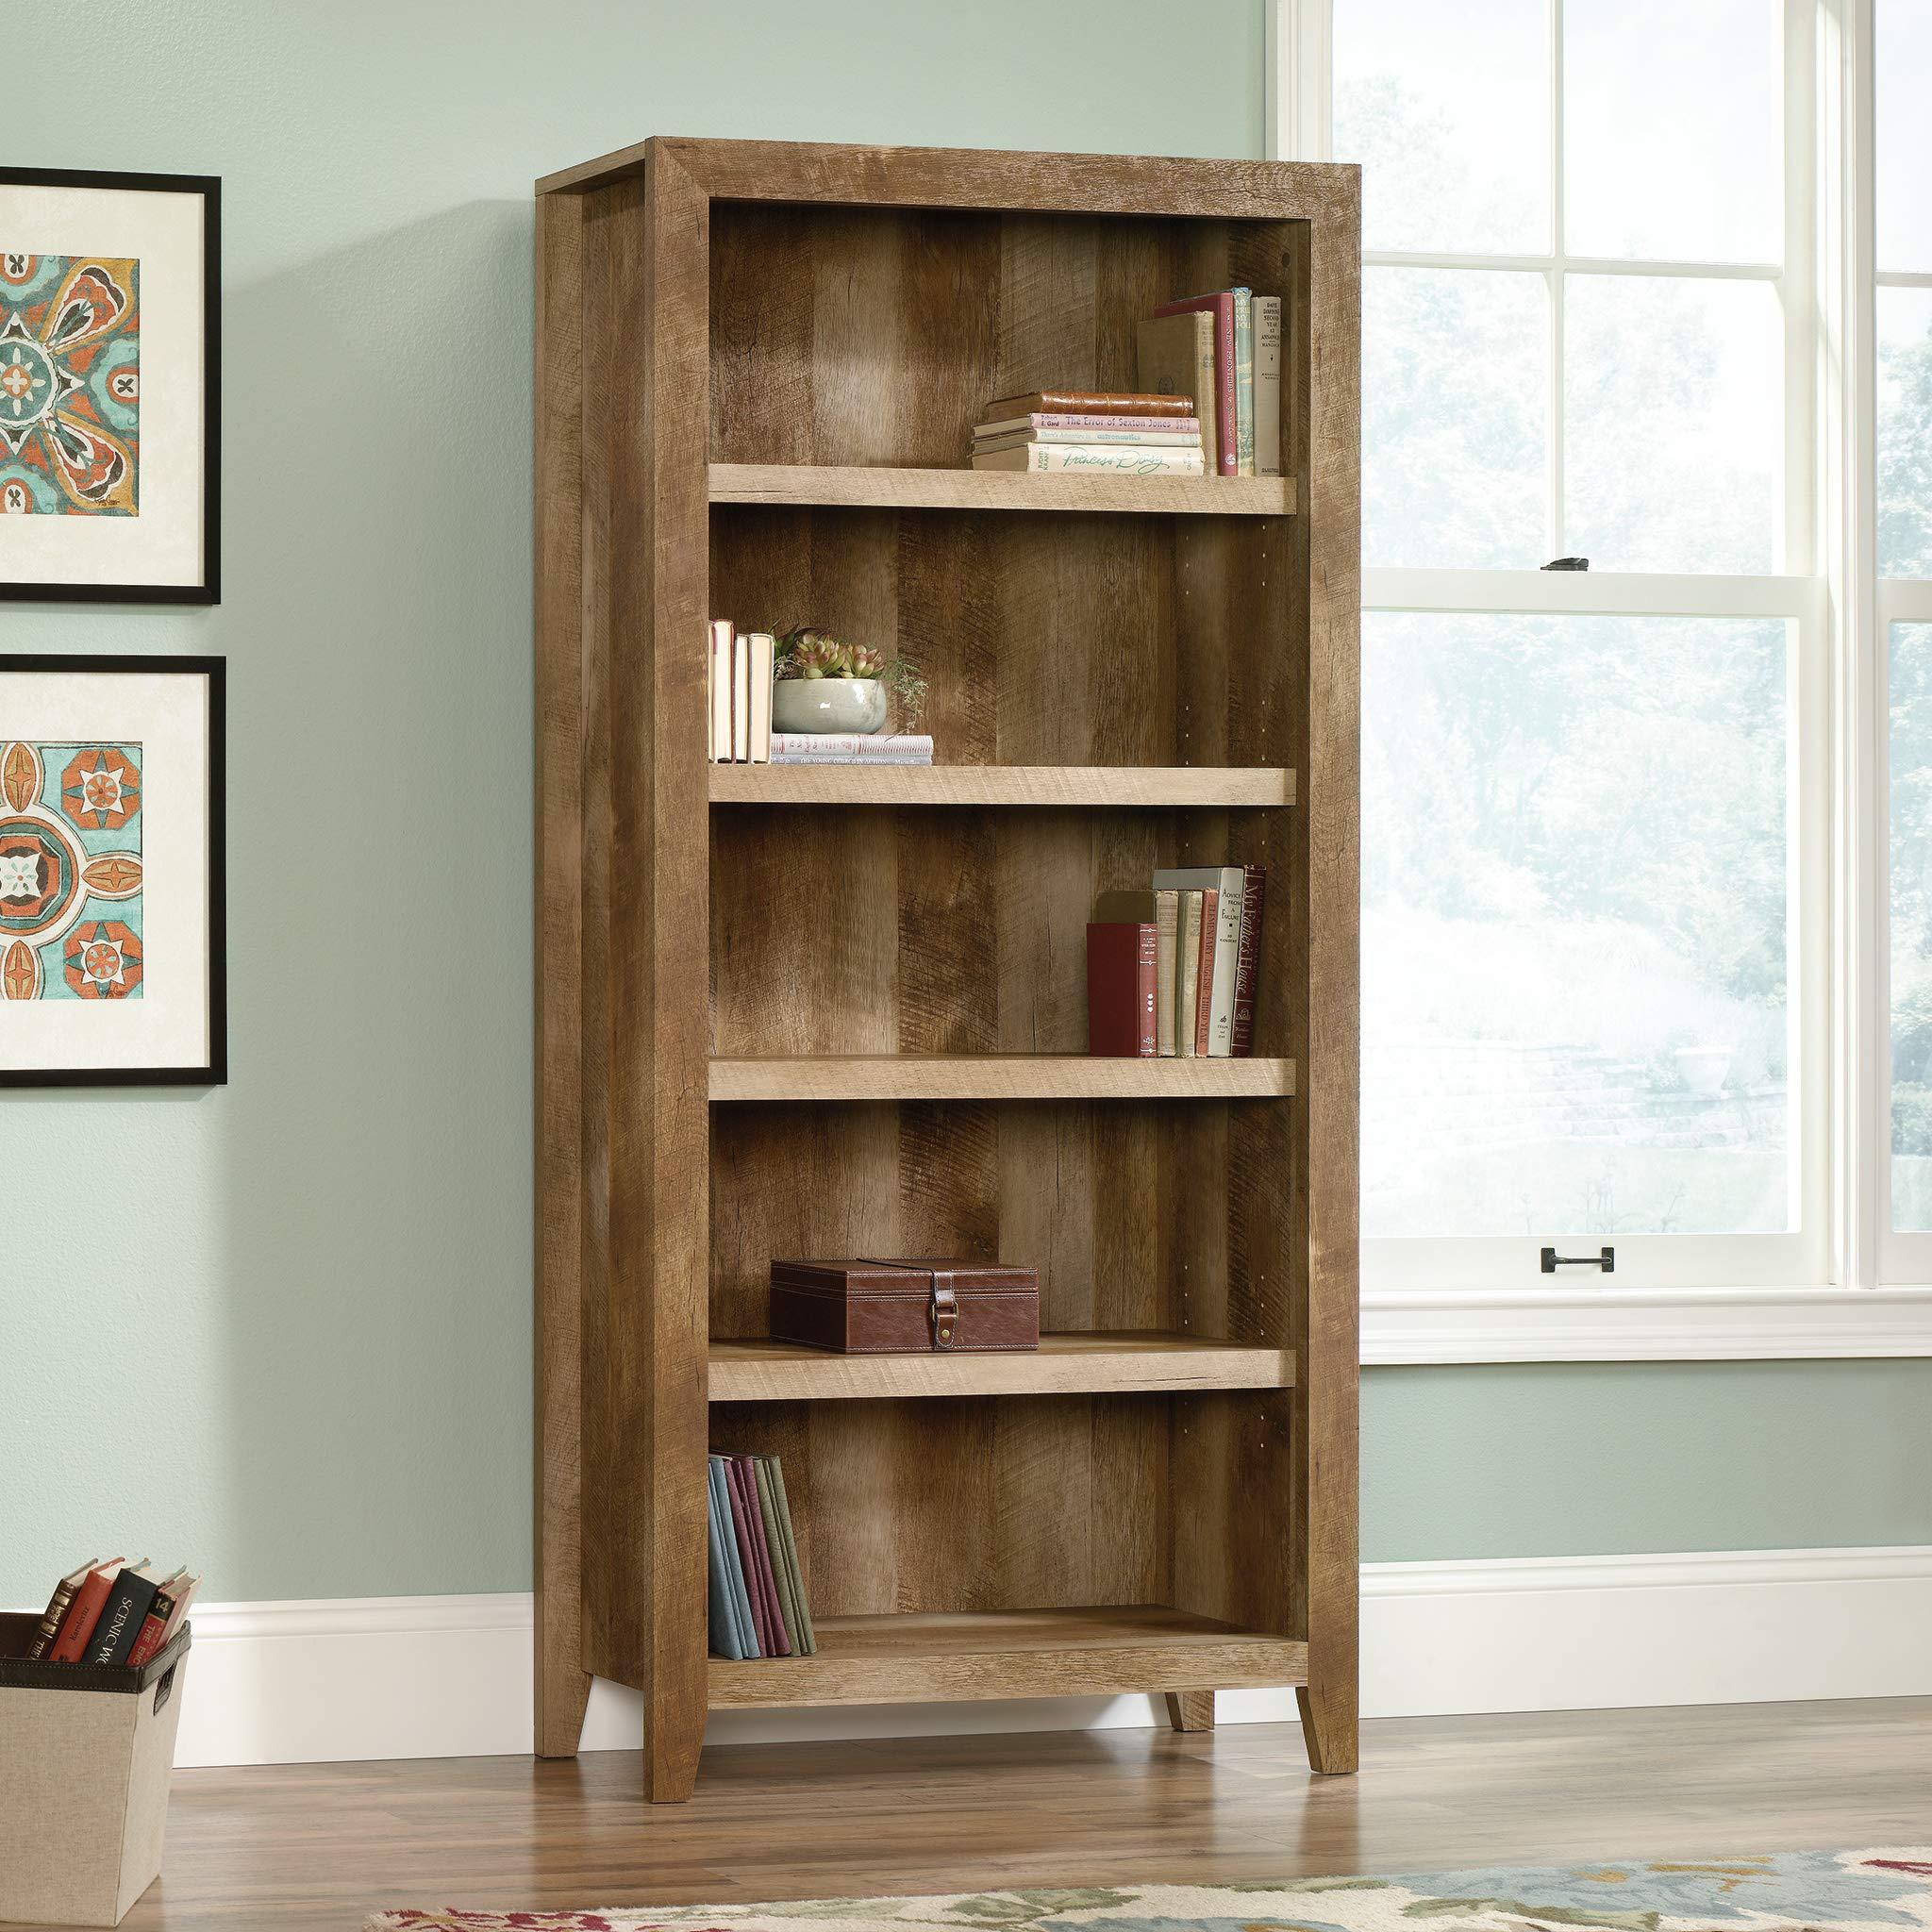 Sauder 418546 Dakota Pass 5-Shelf Bookcase, L: 33.78'' x W: 12.52'' x H: 71.1, Craftsman Oak finish by Sauder (Image #5)